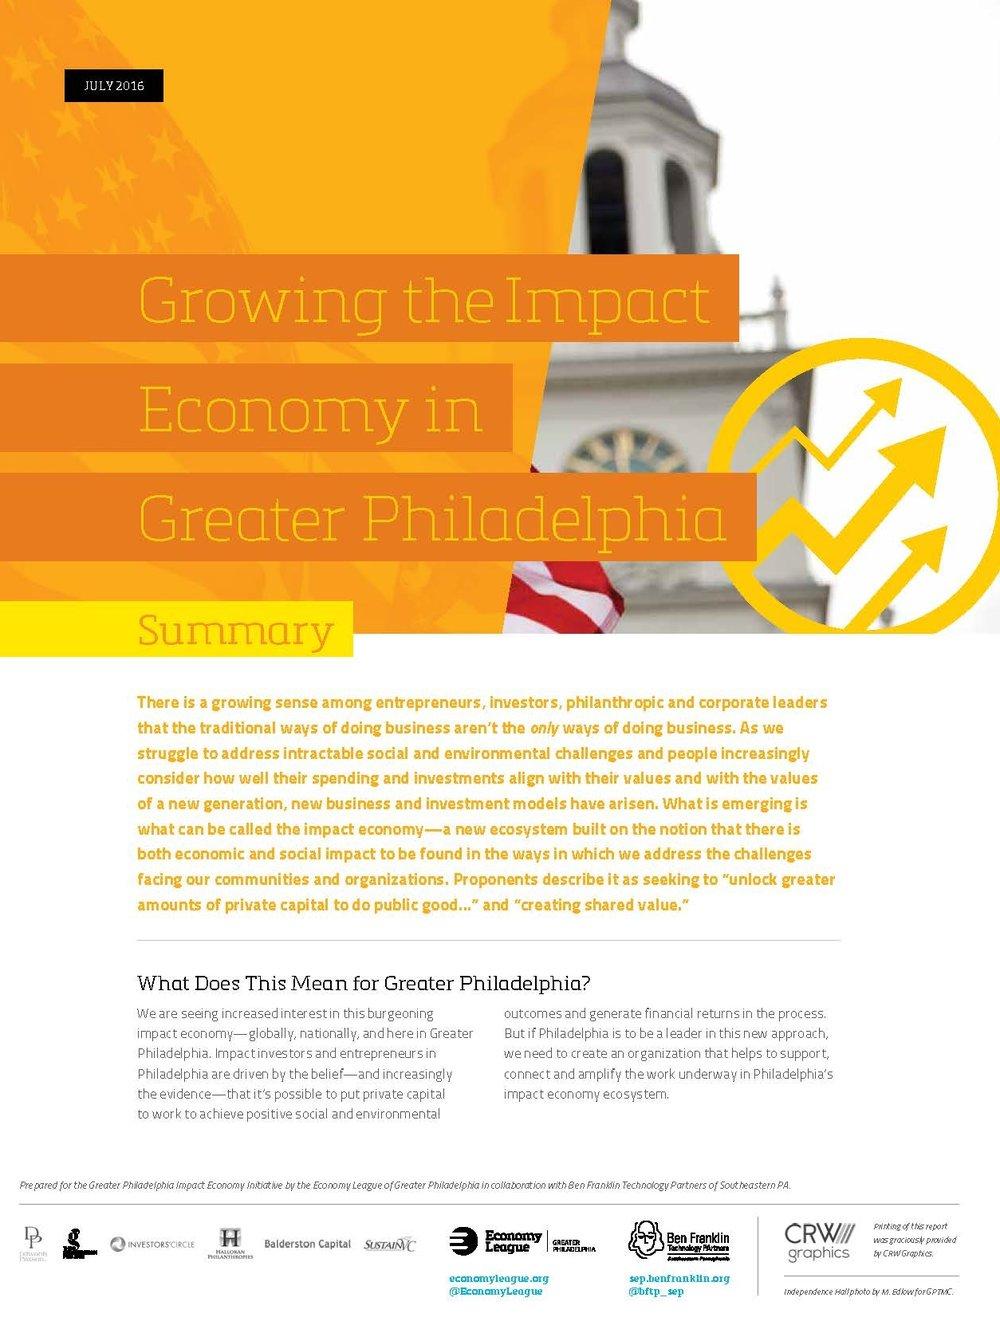 Gr-Philadelphia-Impact-Economy-Report-Summary_Page_1.jpg